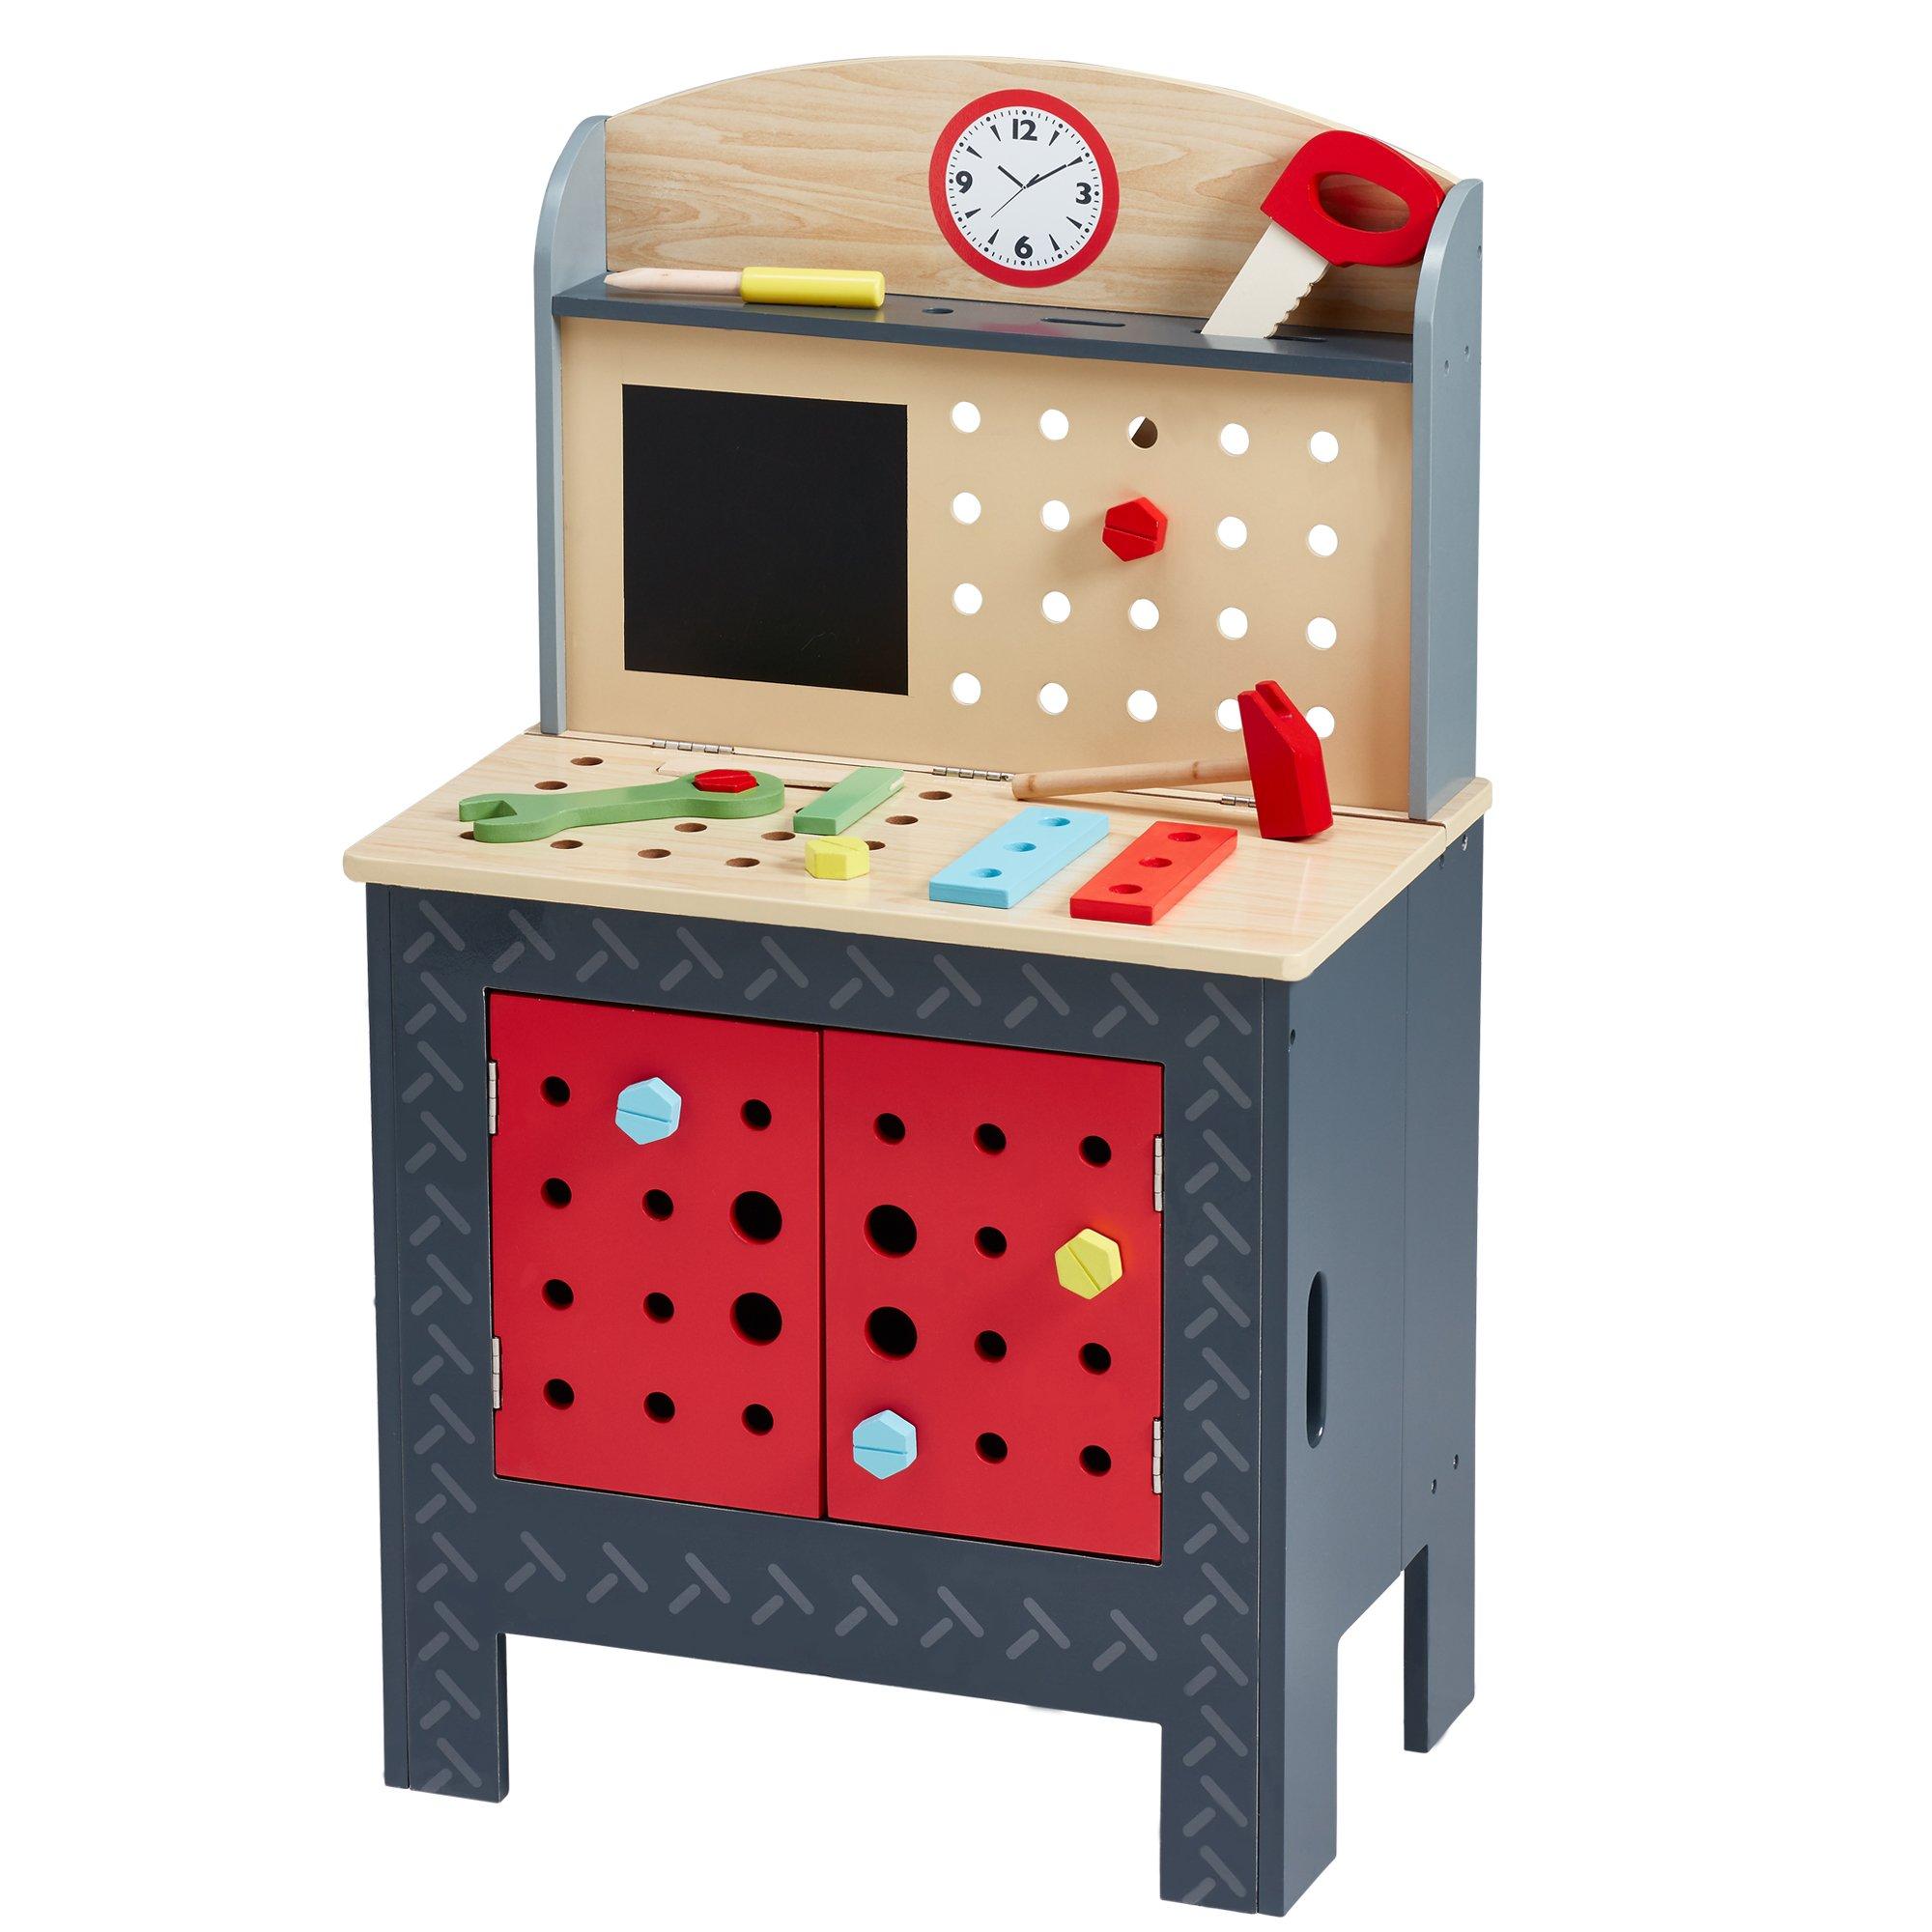 Teamson Kids Little Engineer Foldable Wooden Workbench, Multicolor KYW-12027AR